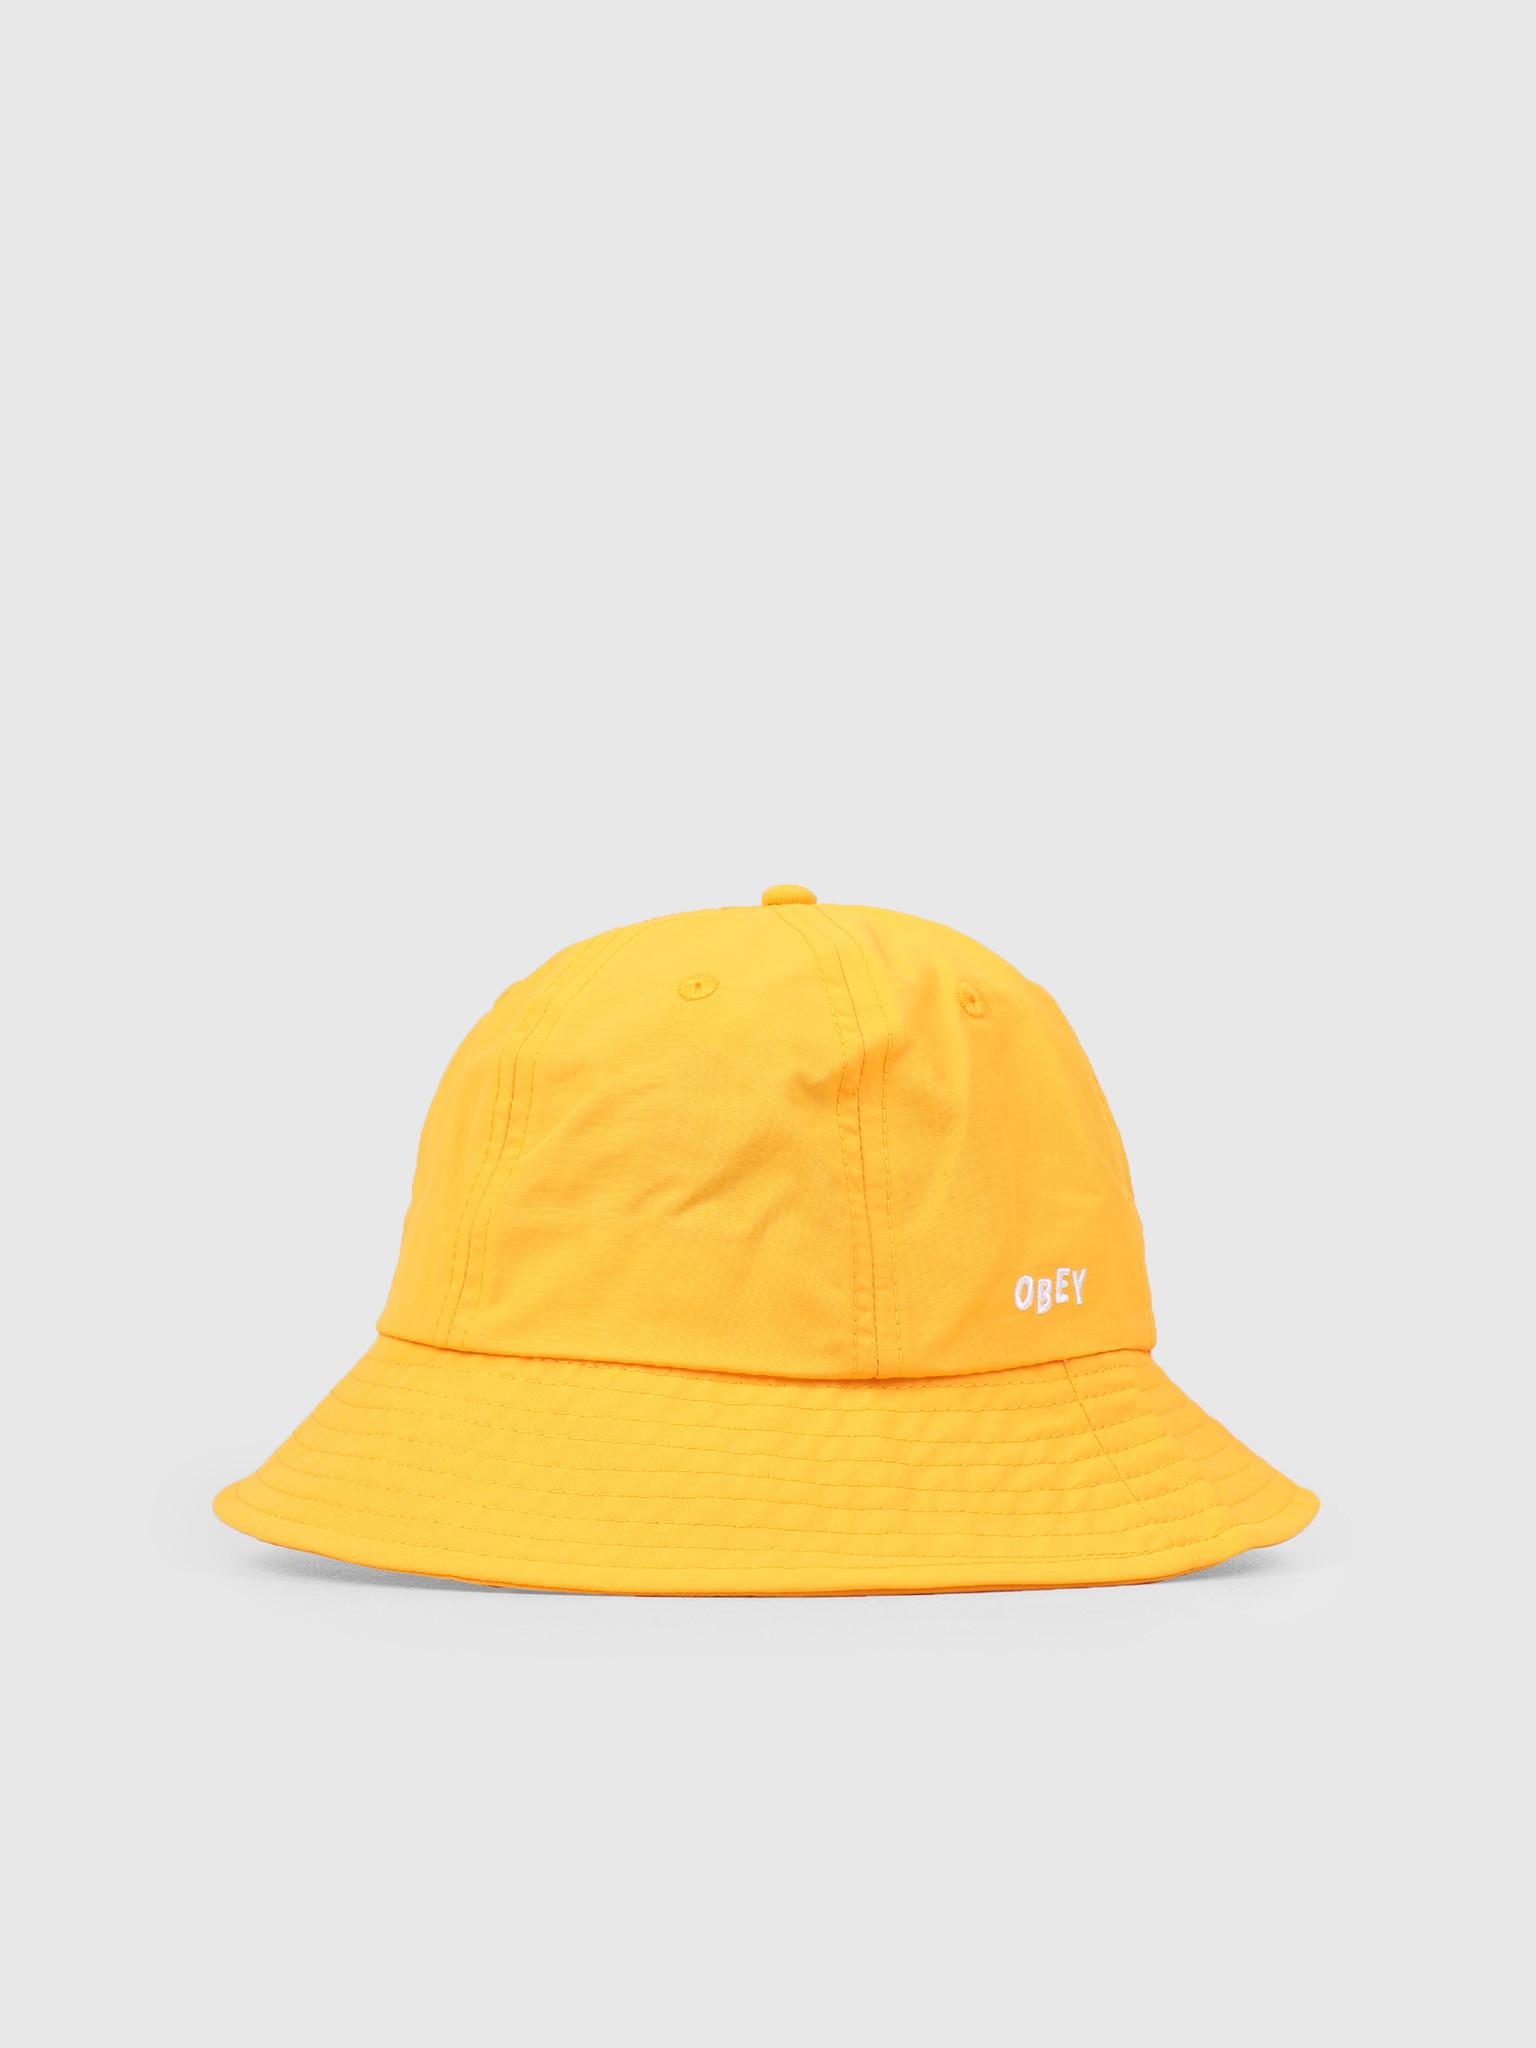 895f34c097a Obey Frederick Bucket Hat EYL 100520019 - FRESHCOTTON